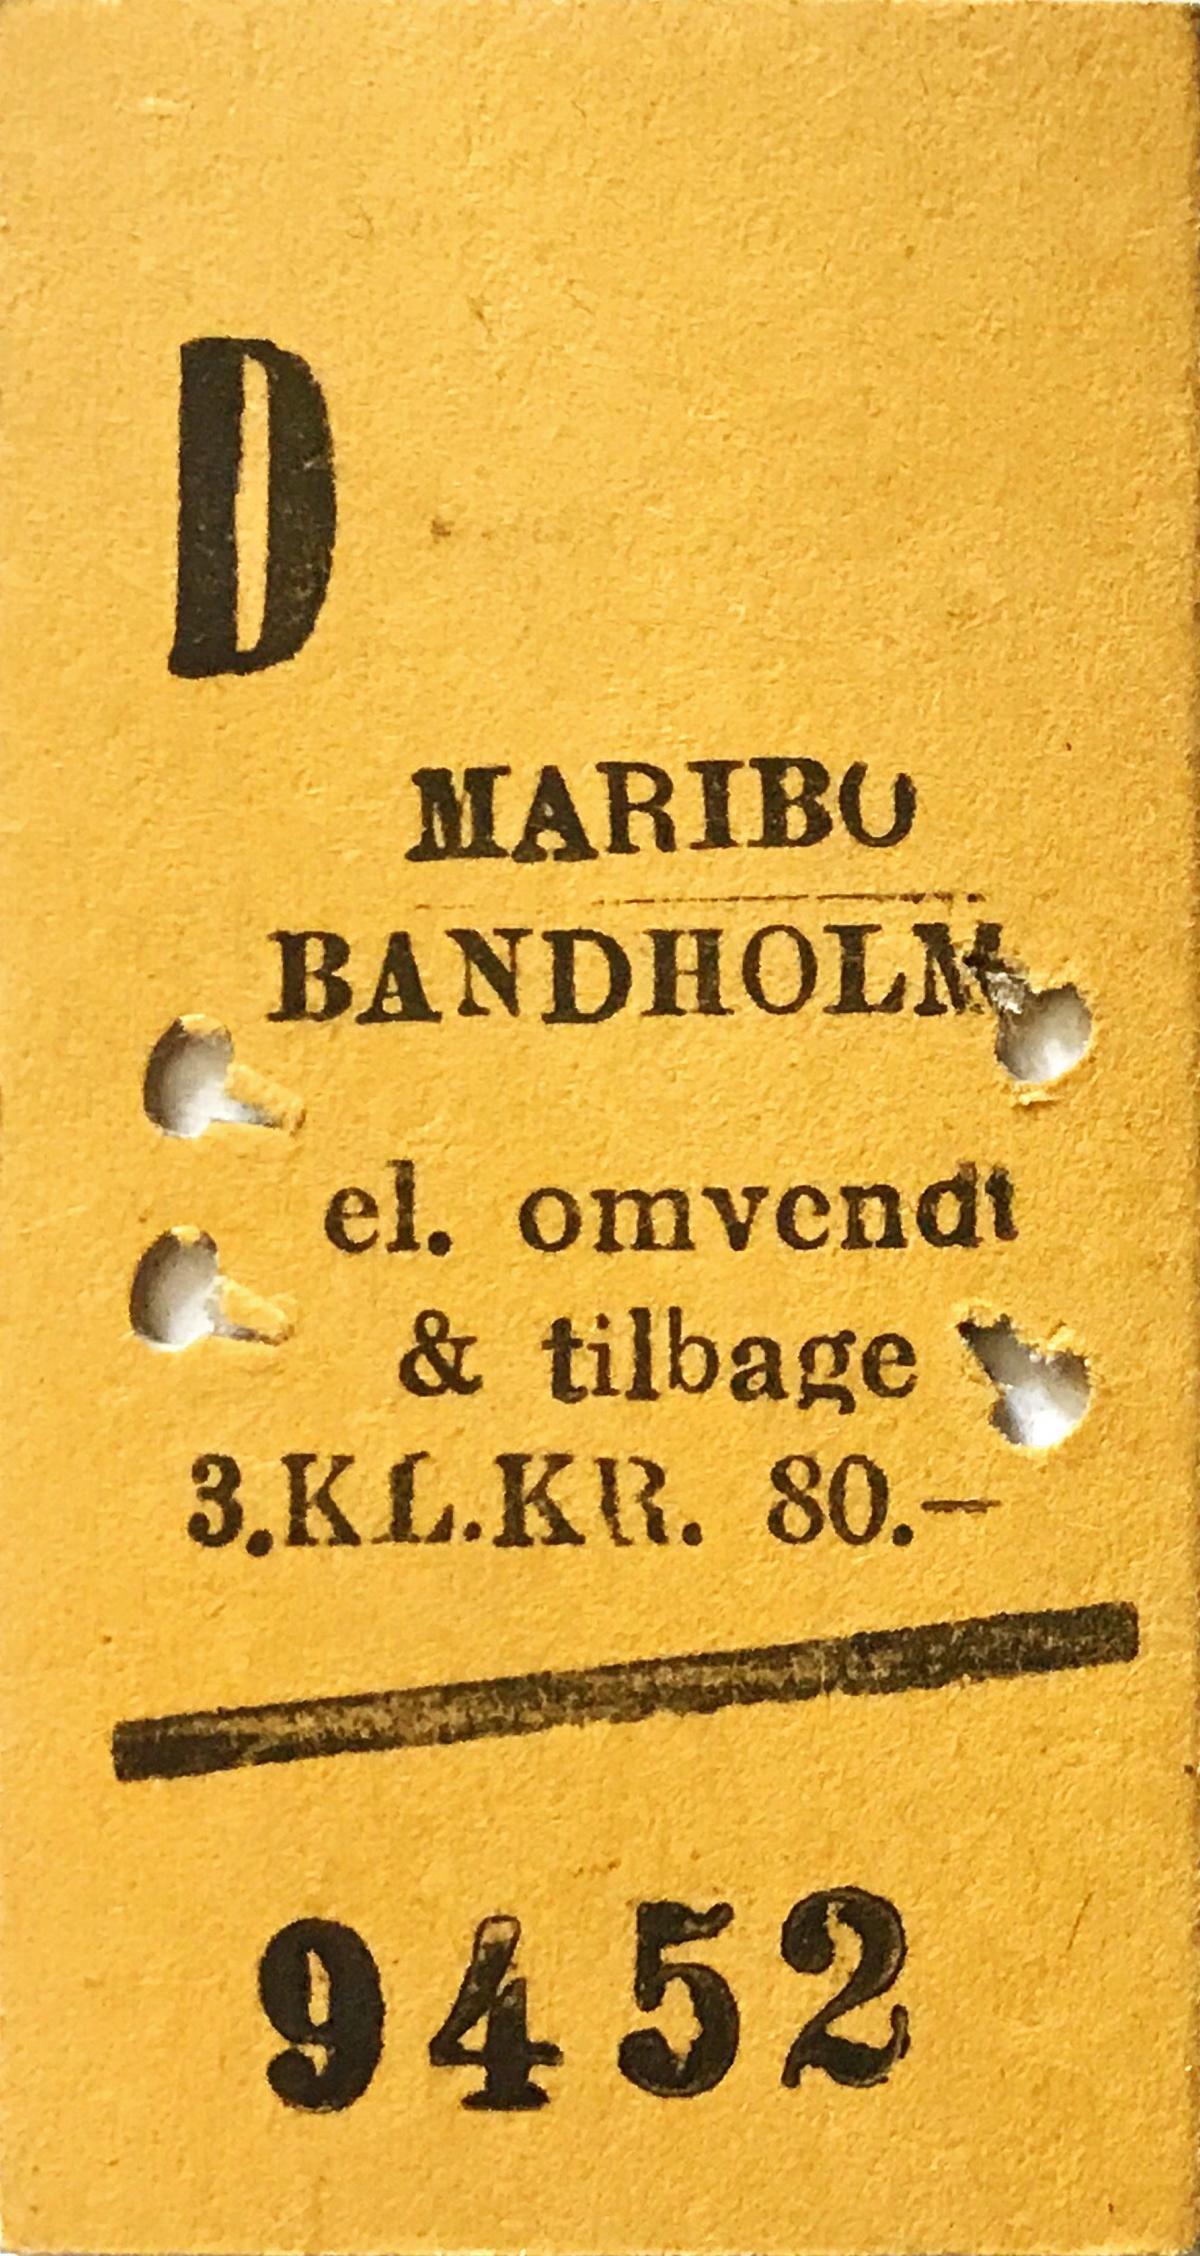 ©Foto: Christian Wodzinski | Museumsbahn Maribo-Bandholm | Fahrkarte